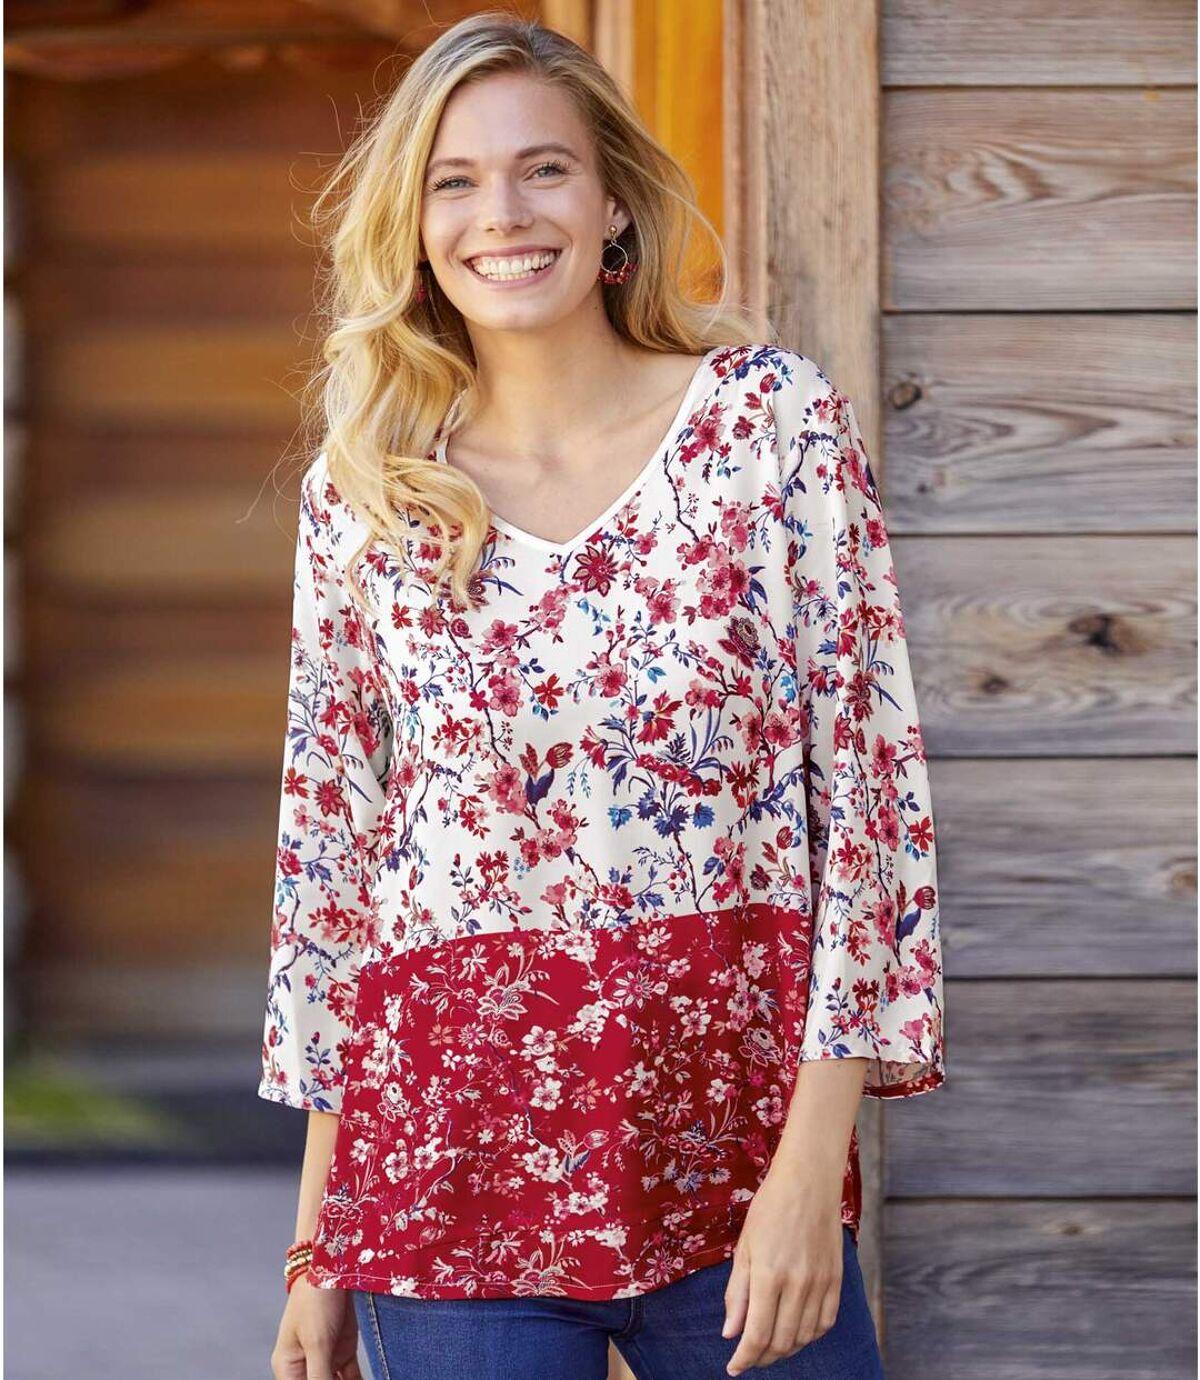 Women's Floral Crepe Blouse - Red Off-White Atlas For Men